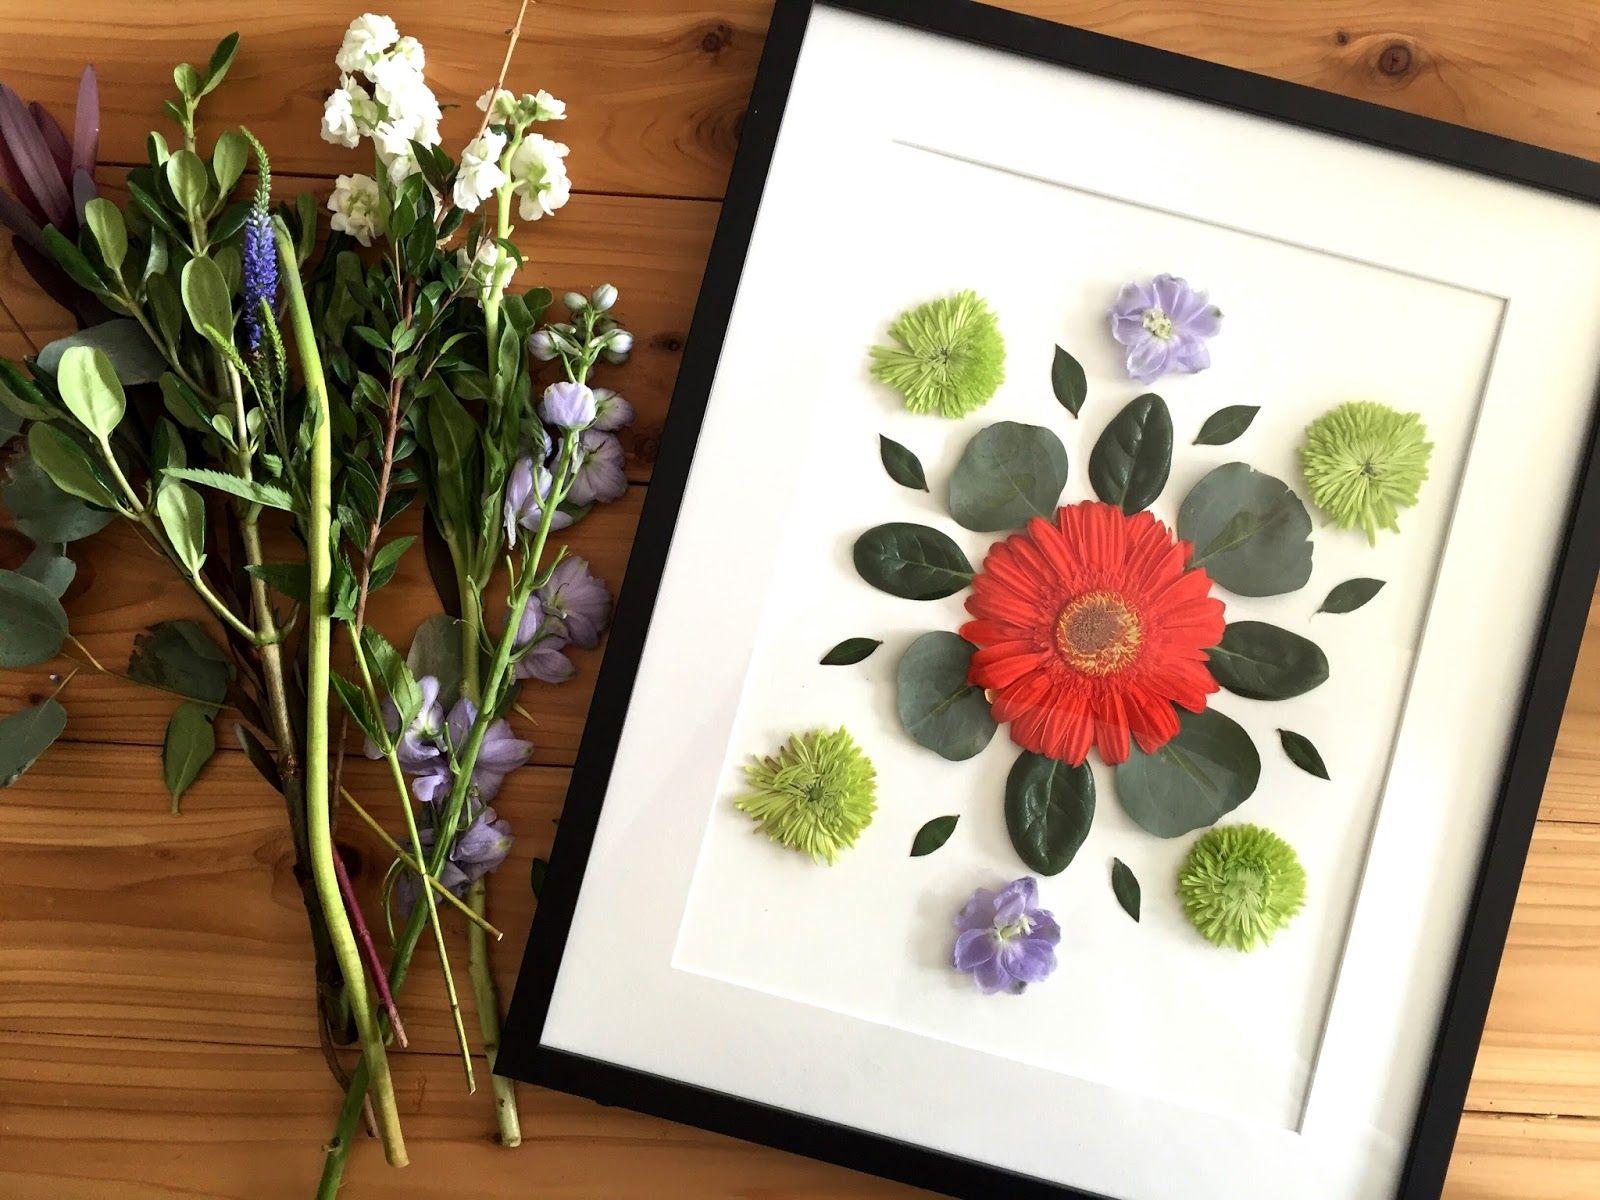 Diy floral art the urban acres to do diy pinterest diy and